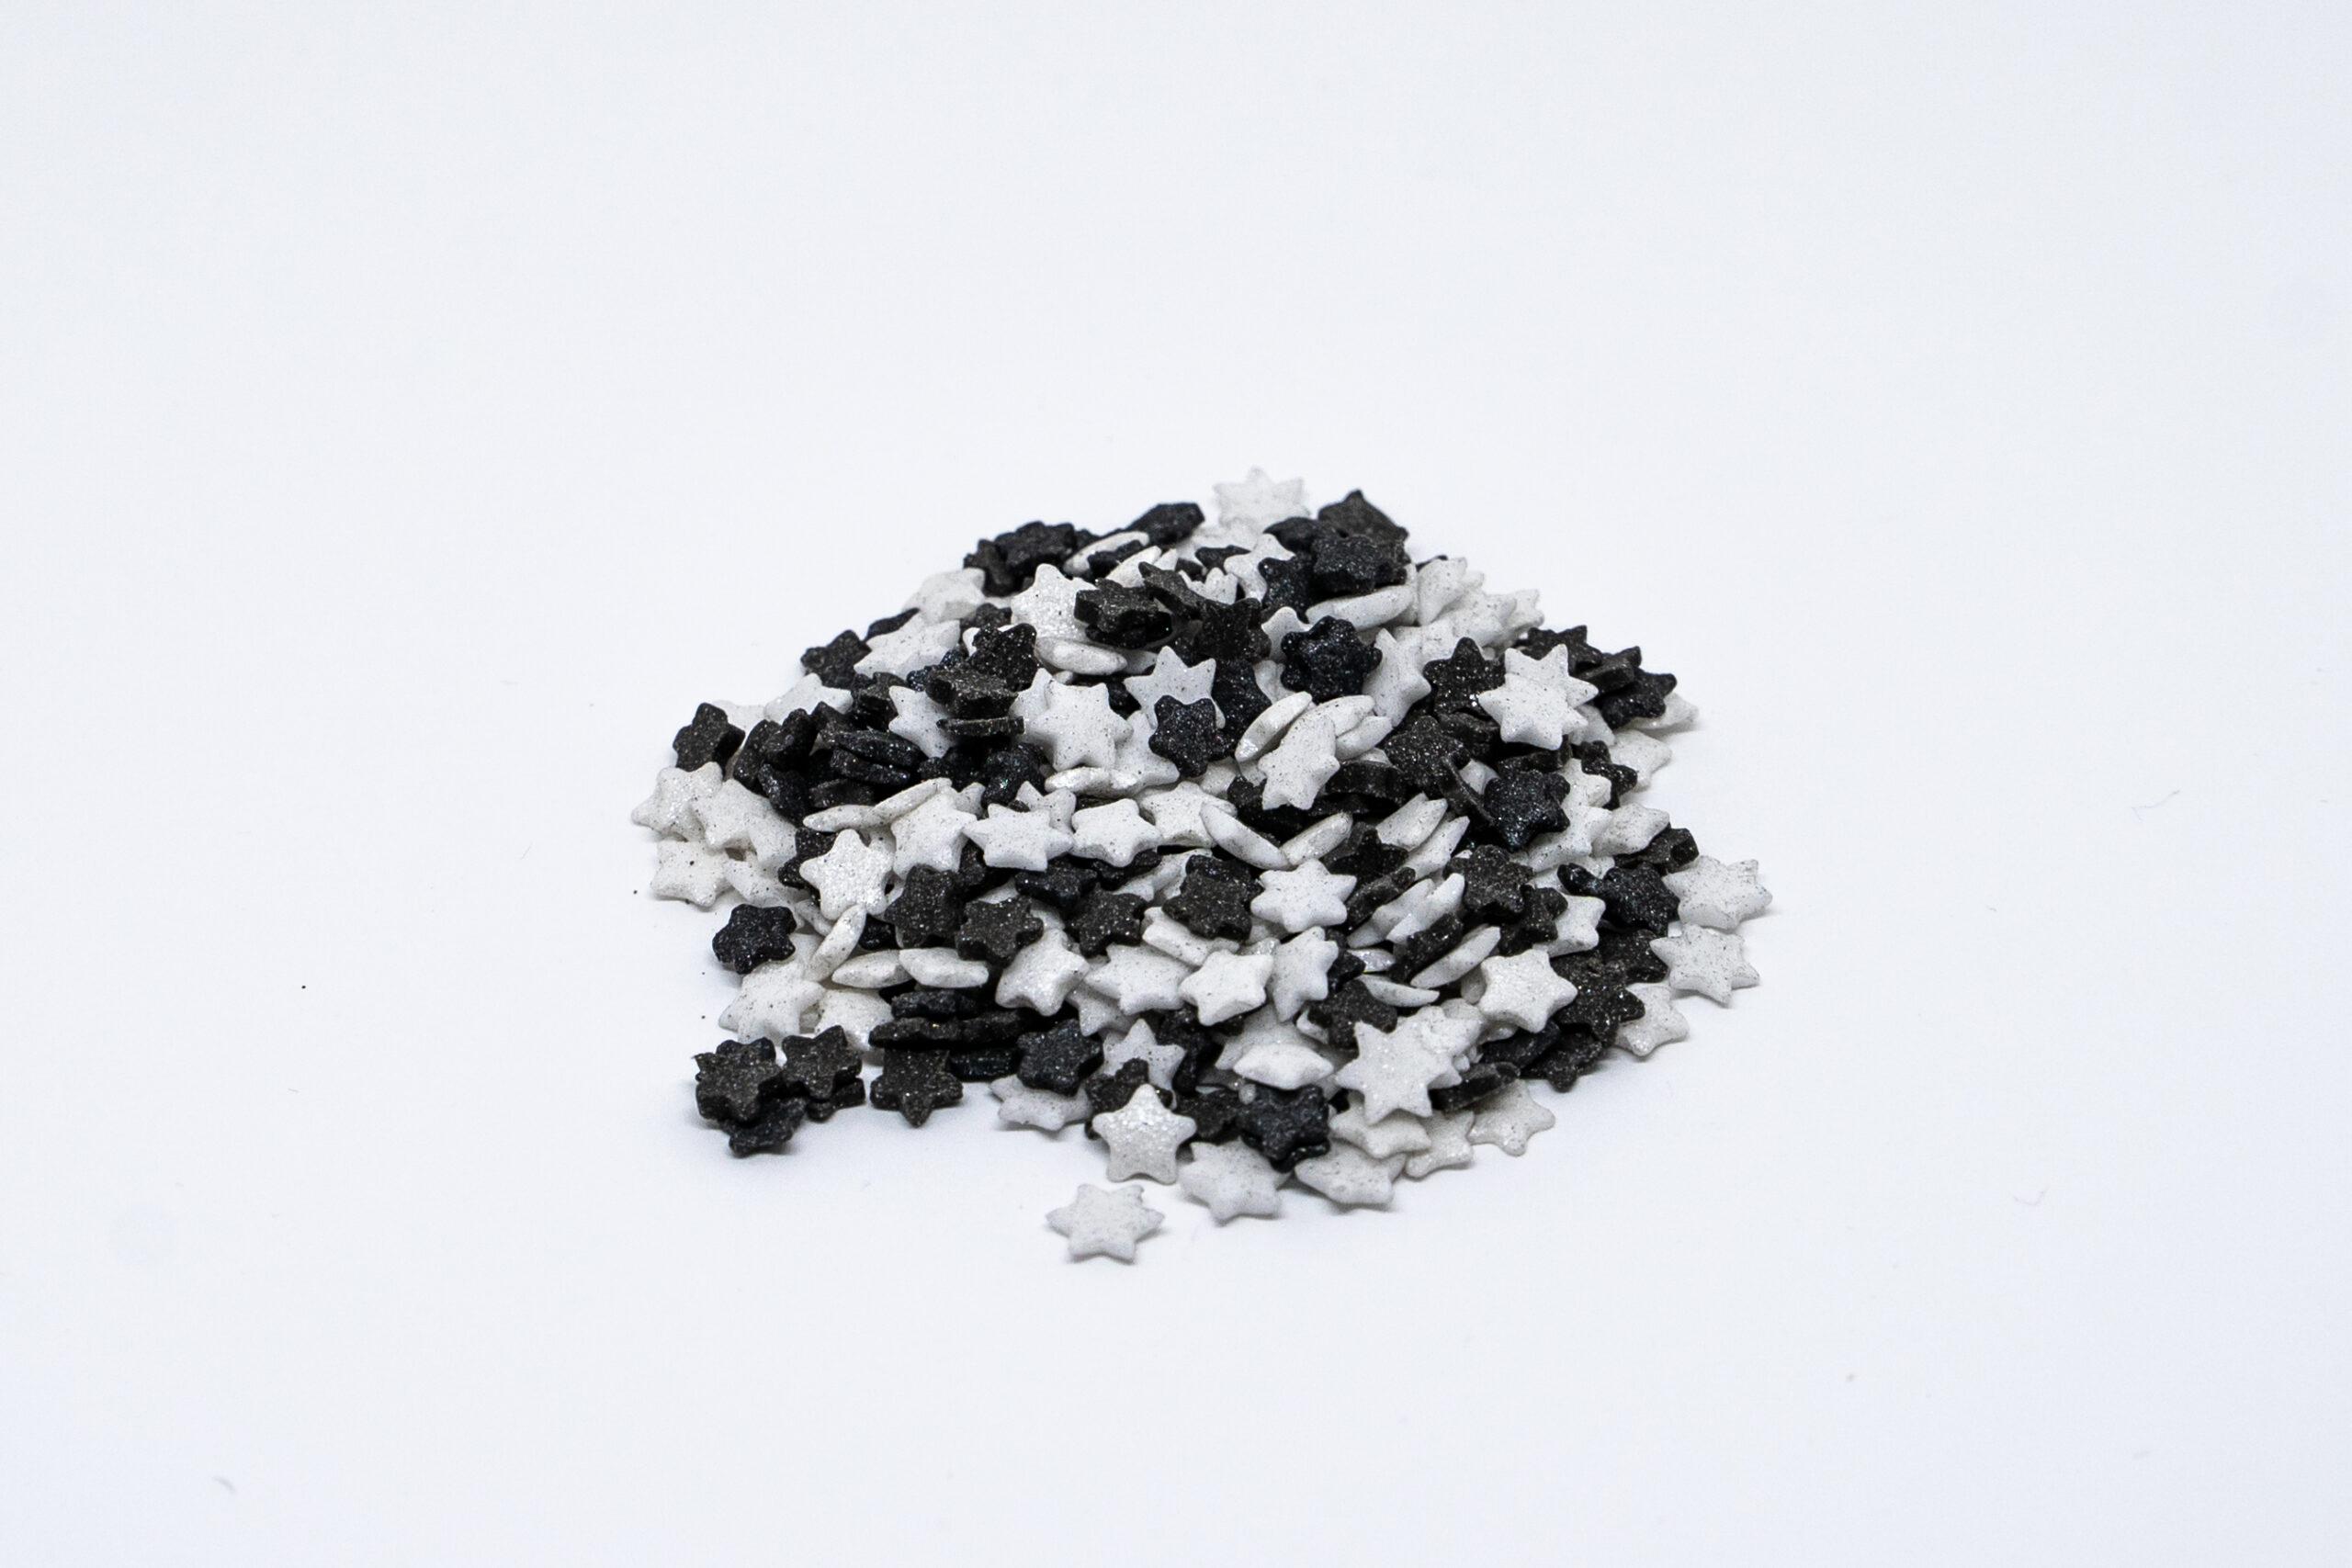 White and Black stars